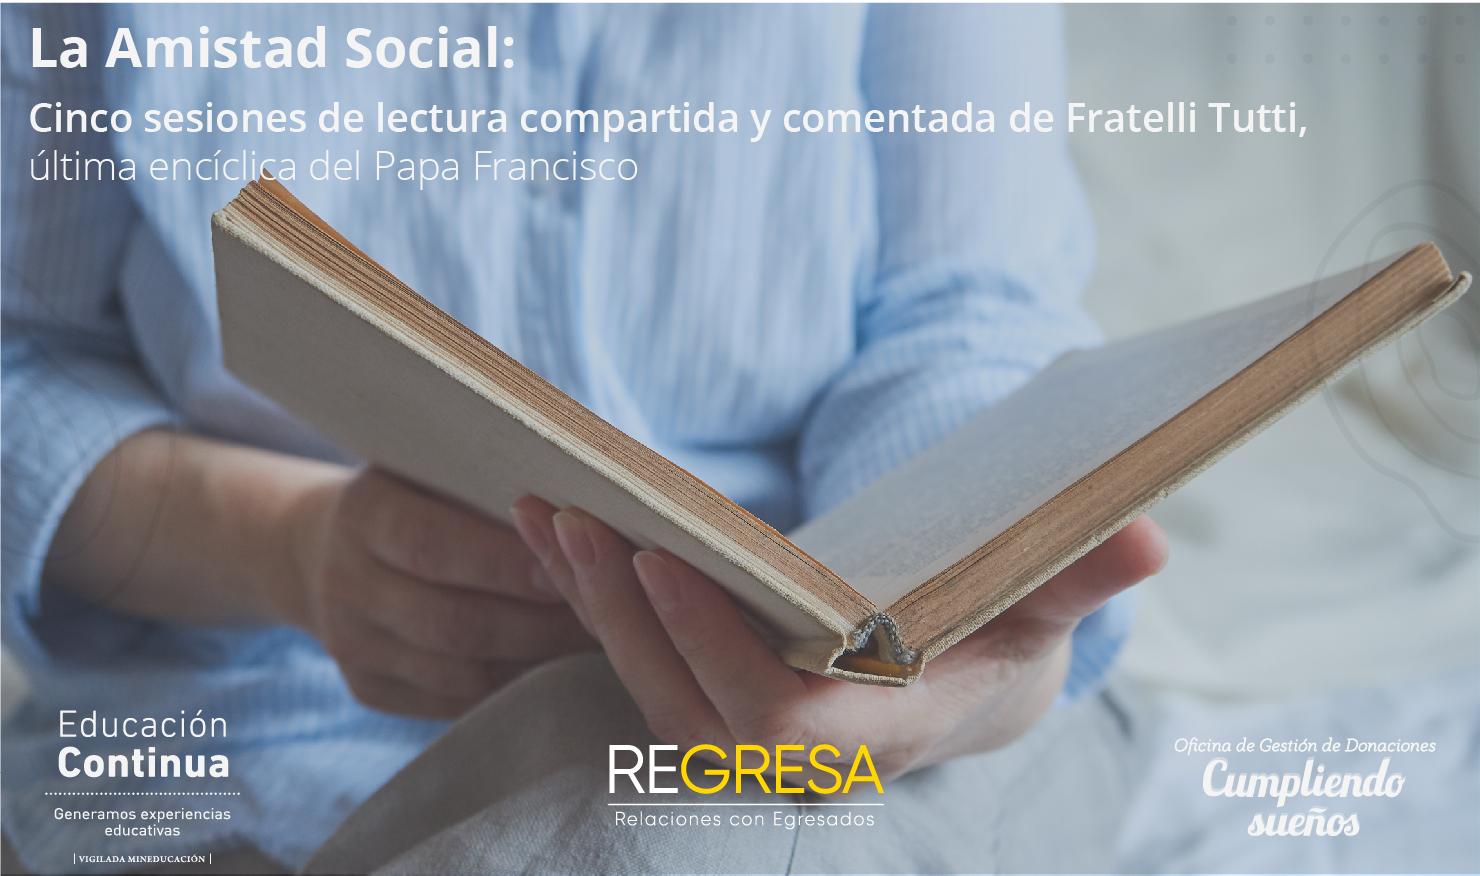 La Amistad Social